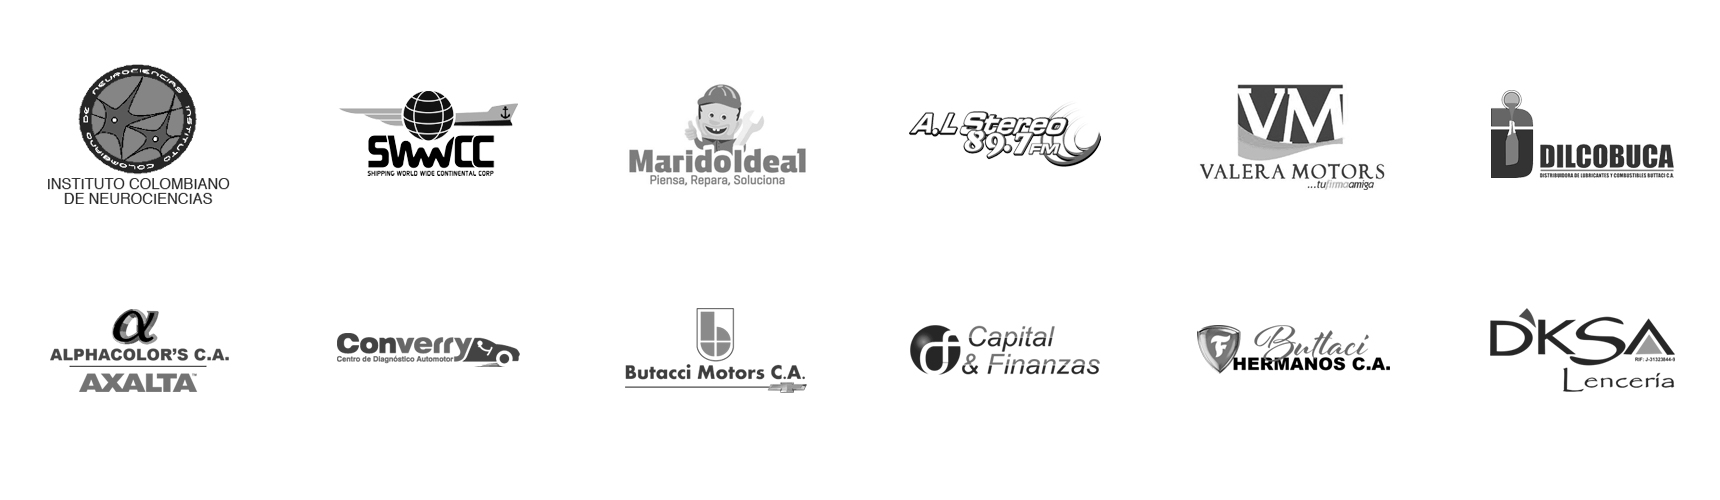 Instituto Colombiano de Neurociencias, Shipping Worldwide Continental Corp, A.L Stereo 89.7FM, Valera Motors S.A., Dilcobuca, Alphacolor's C.A., CDA Converry, Buttaci Motors C.A., Capital & Finanzas, Buttaci Hermanos C.A., D'ksa Lencería